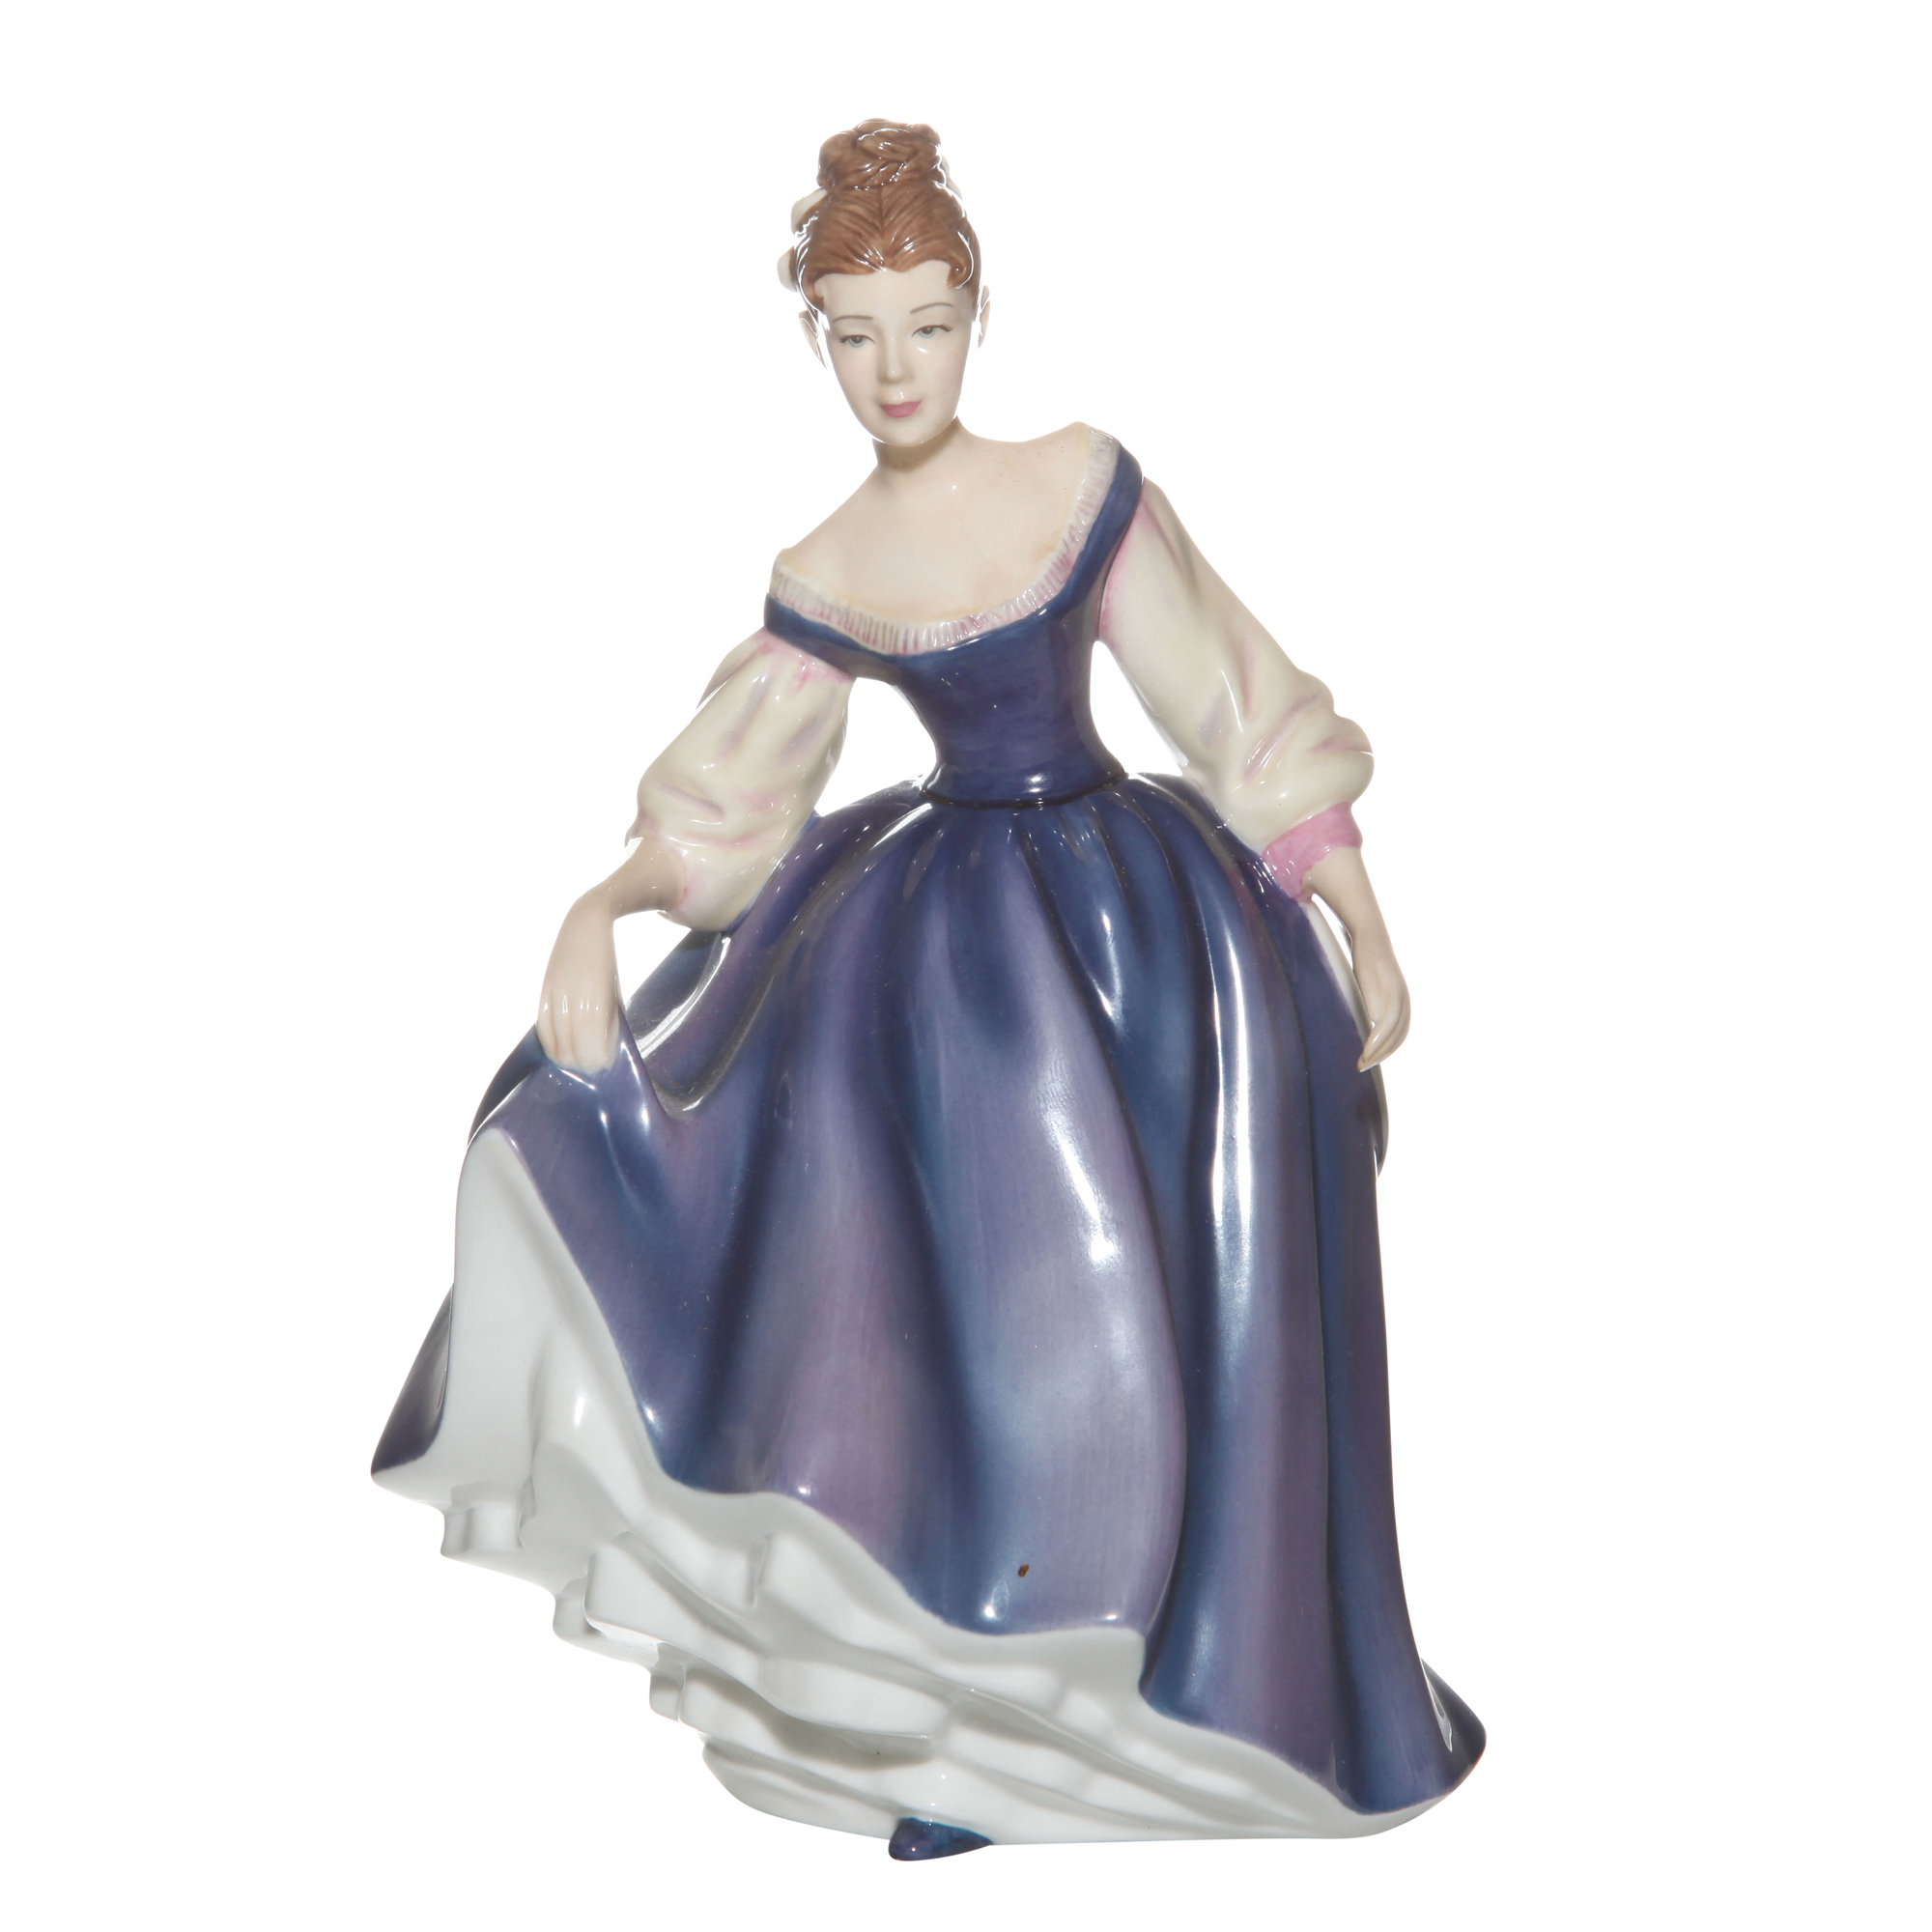 Alyssa HN4833 - Royal Doulton Figurine